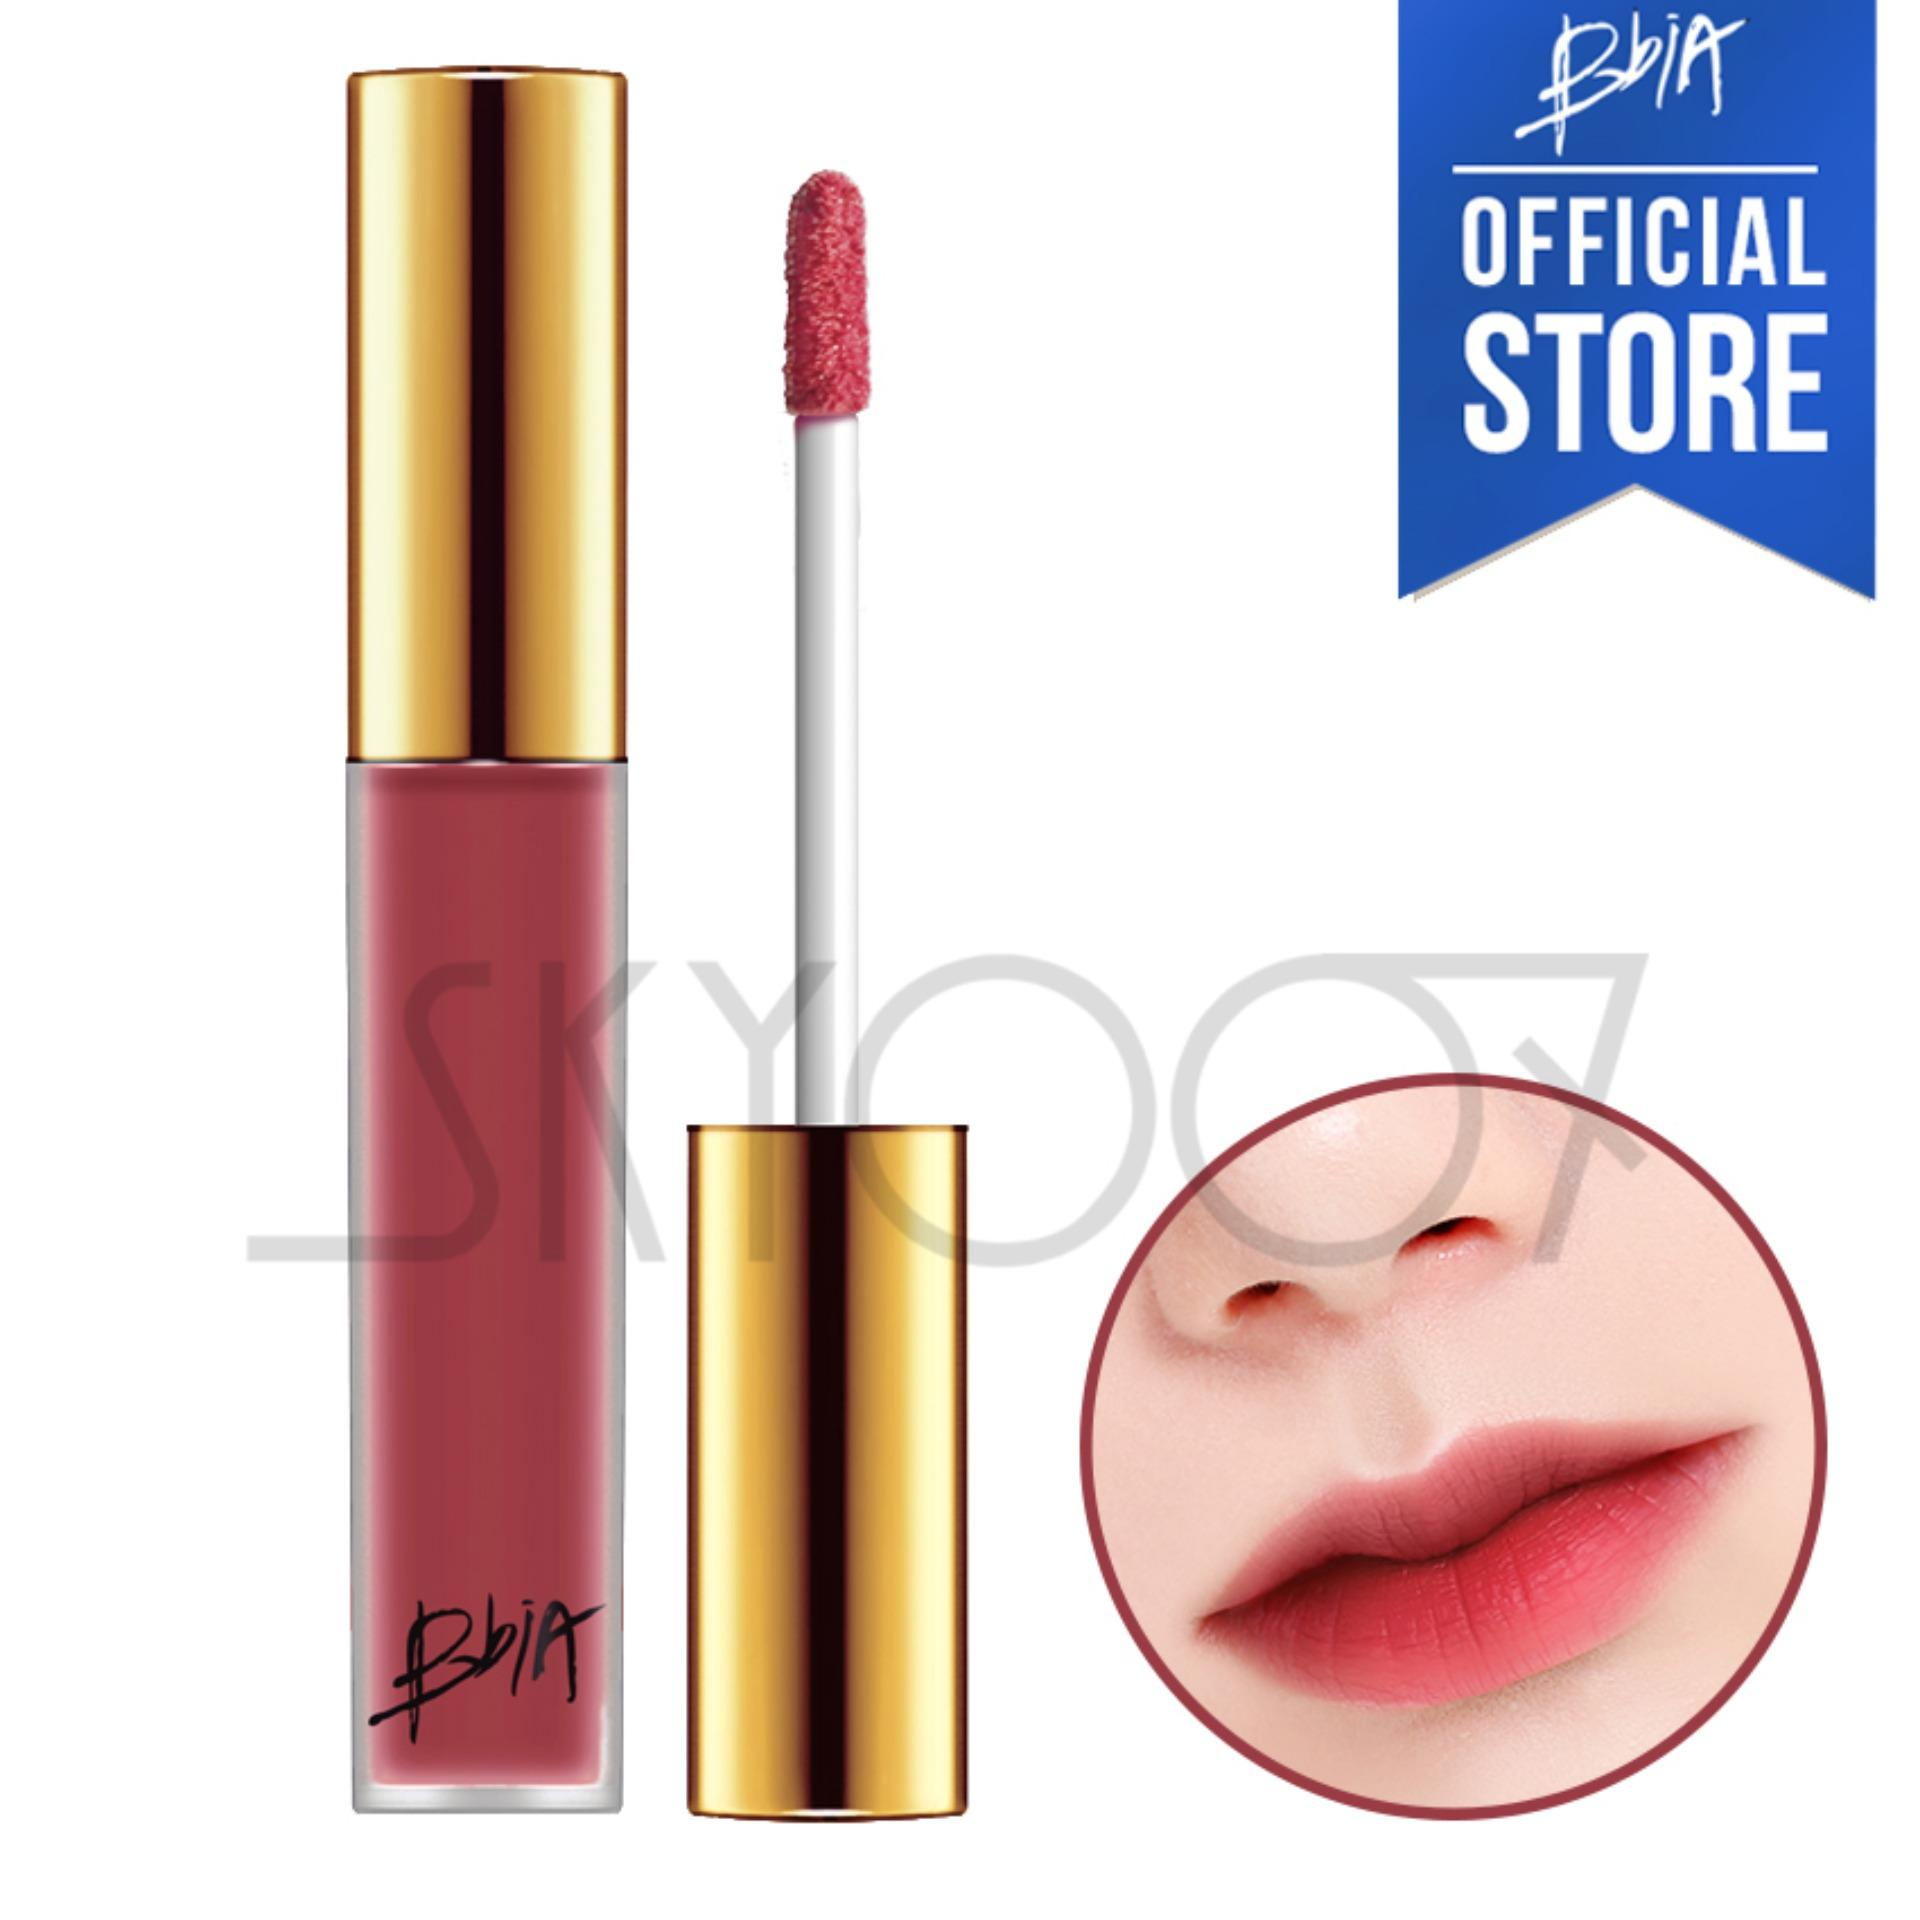 Son kem lì Bbia Last Velvet Lip Tint Version 3 - 11 Calm Boss (Màu hoa hồng) nhập khẩu